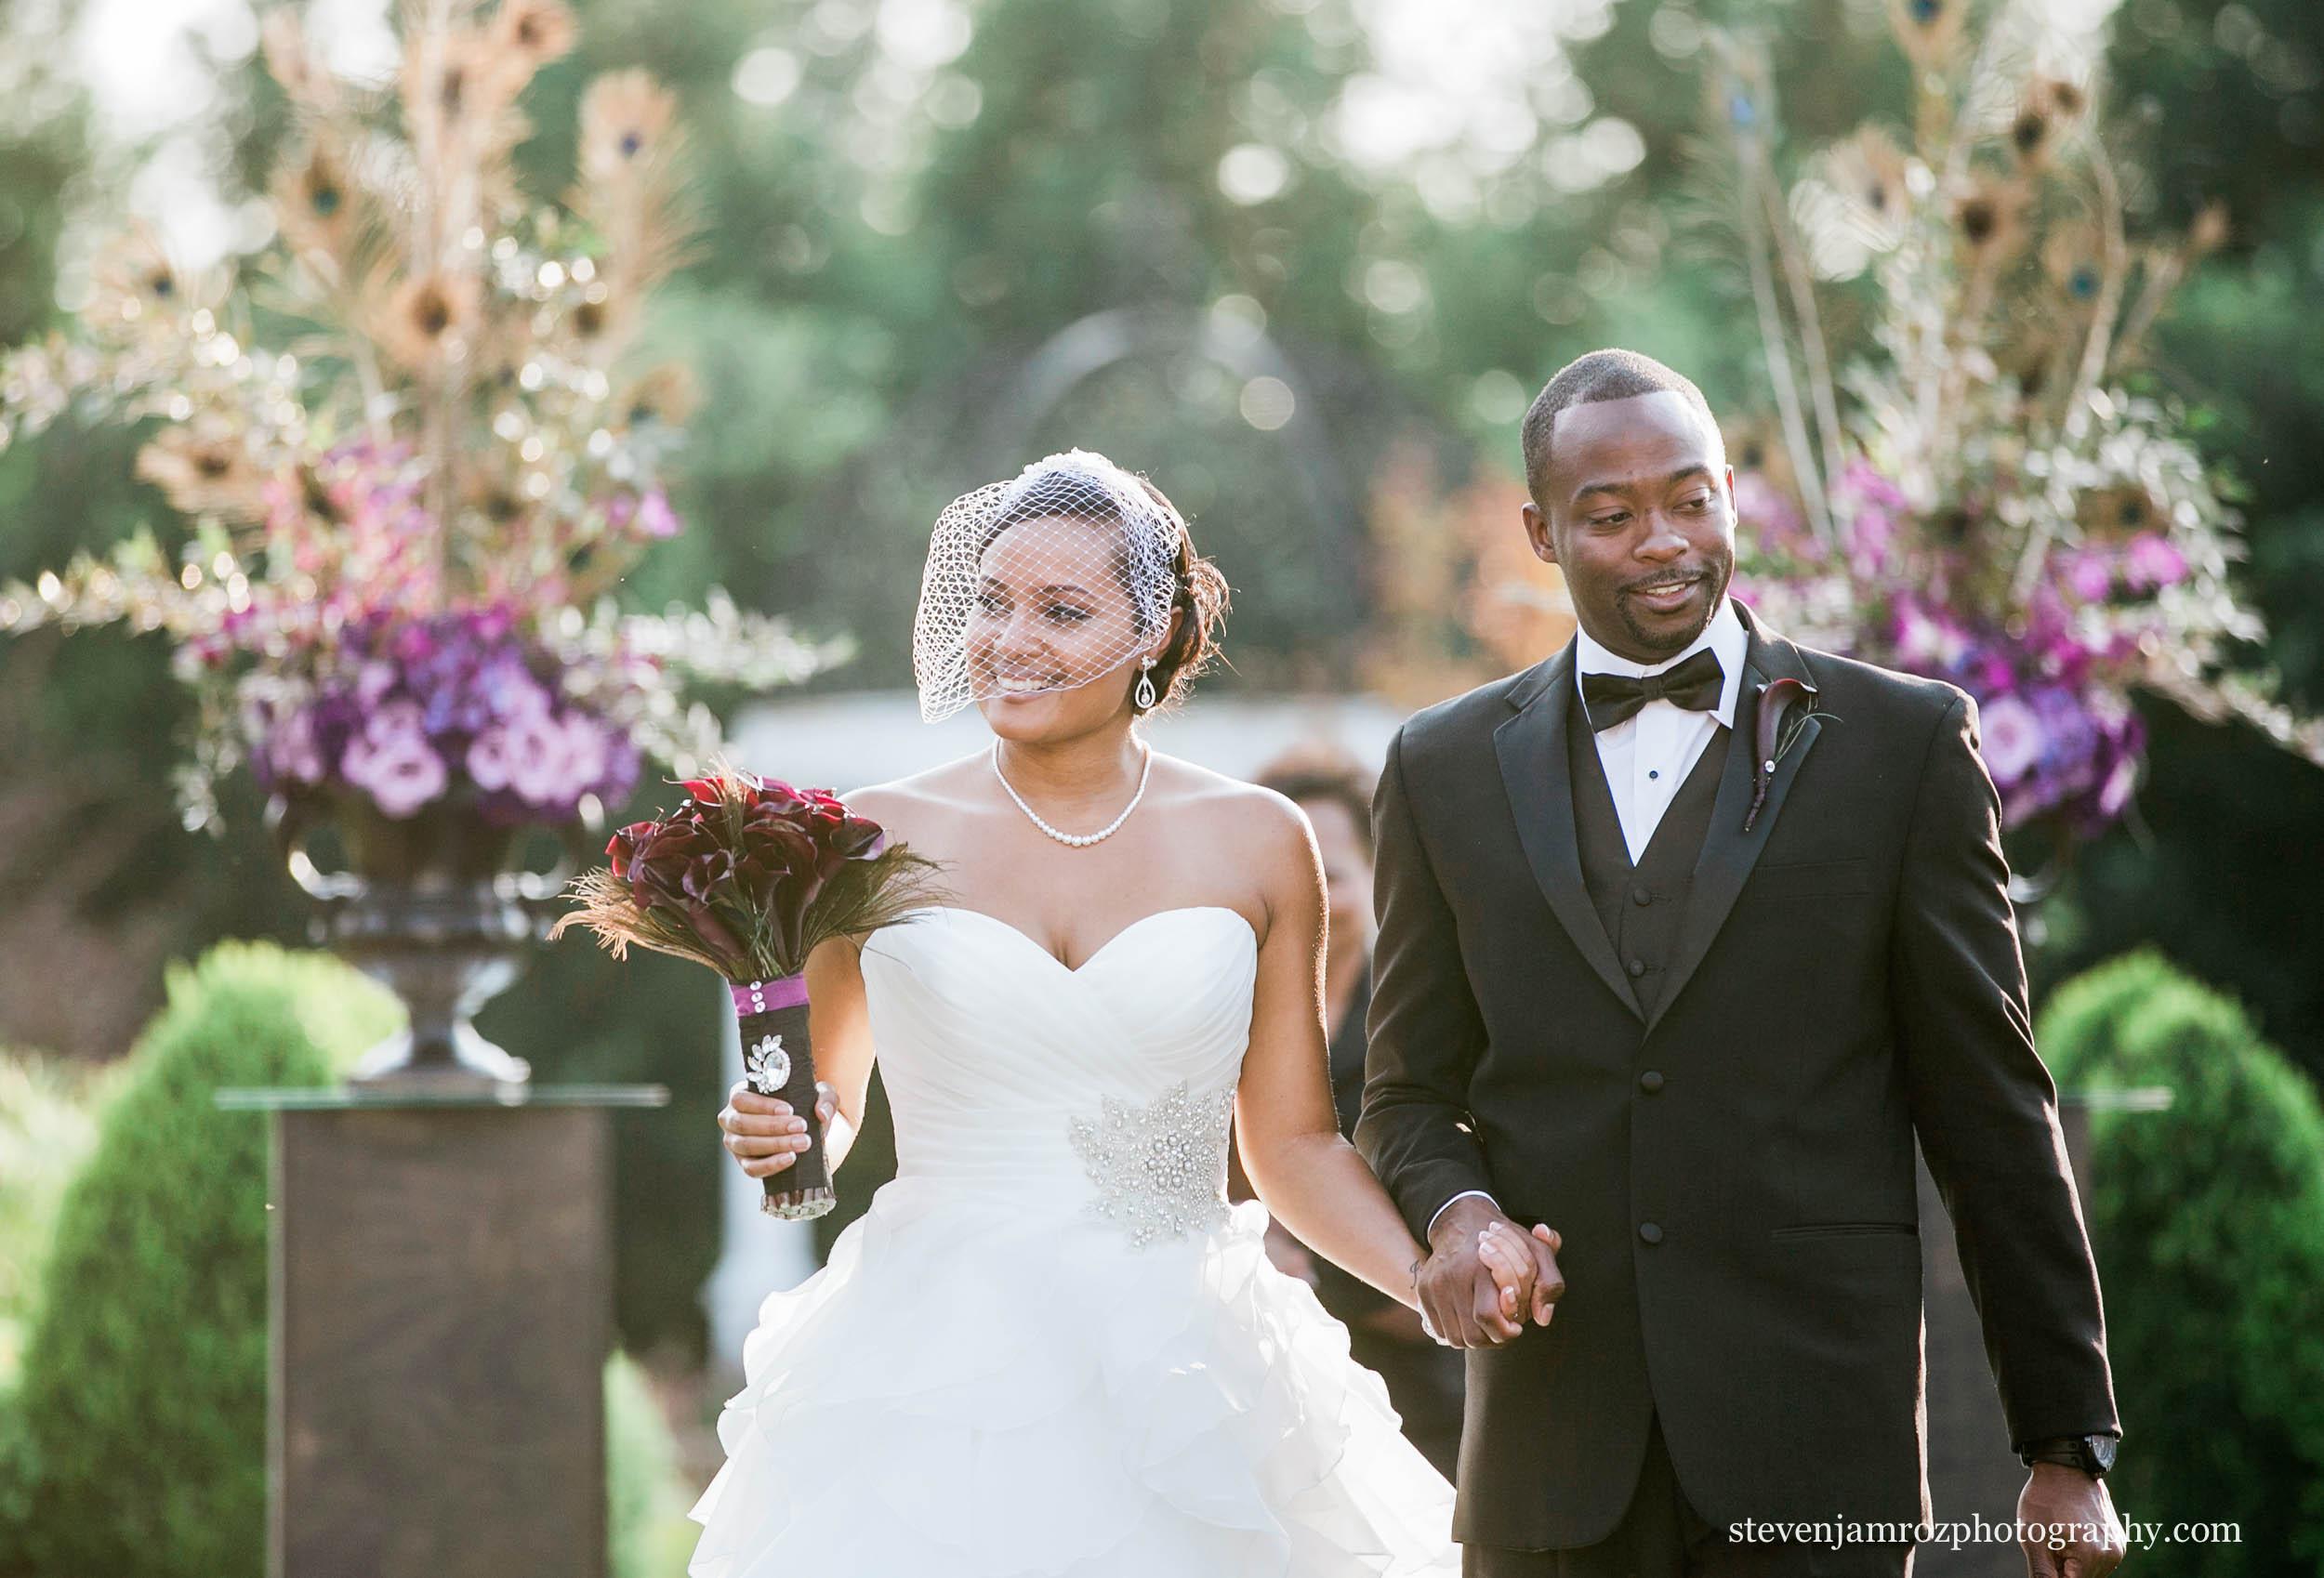 just-married-hall-at-landmark-wedding-steven-jamroz-0695.jpg